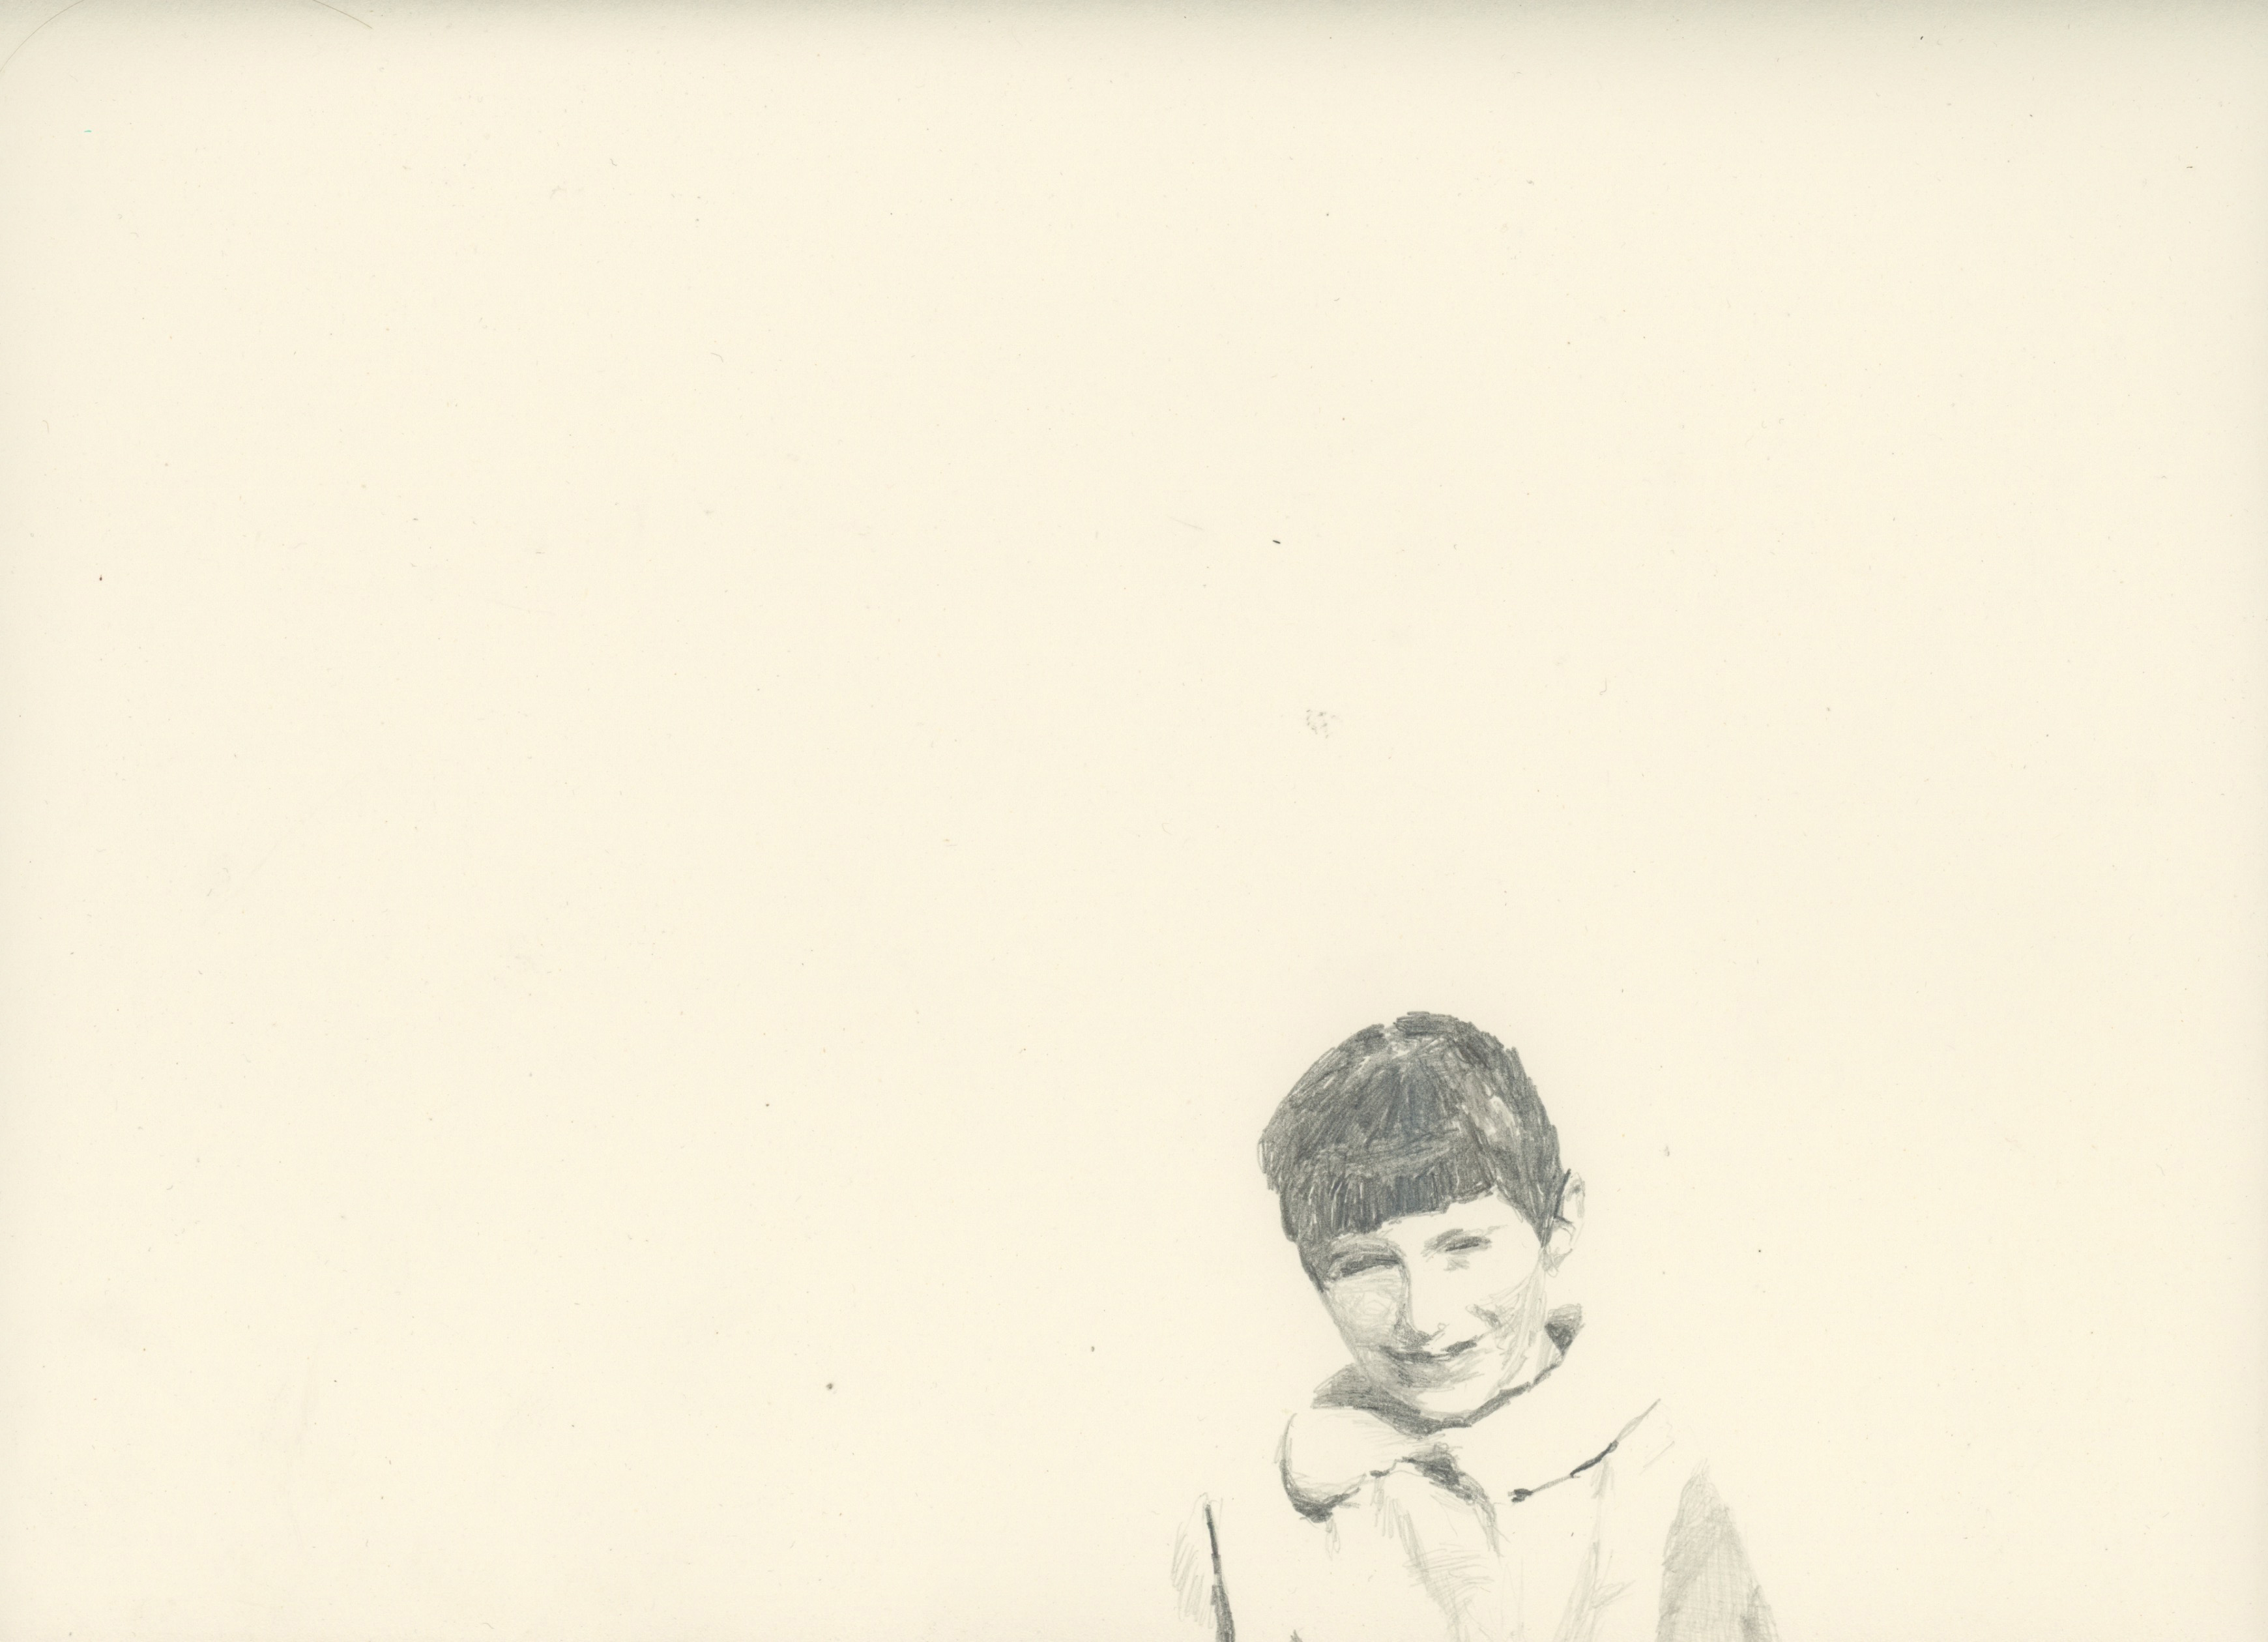 08_-Valentina-D-Accardi-Elisa-4-matita-su-carta-35x24cm